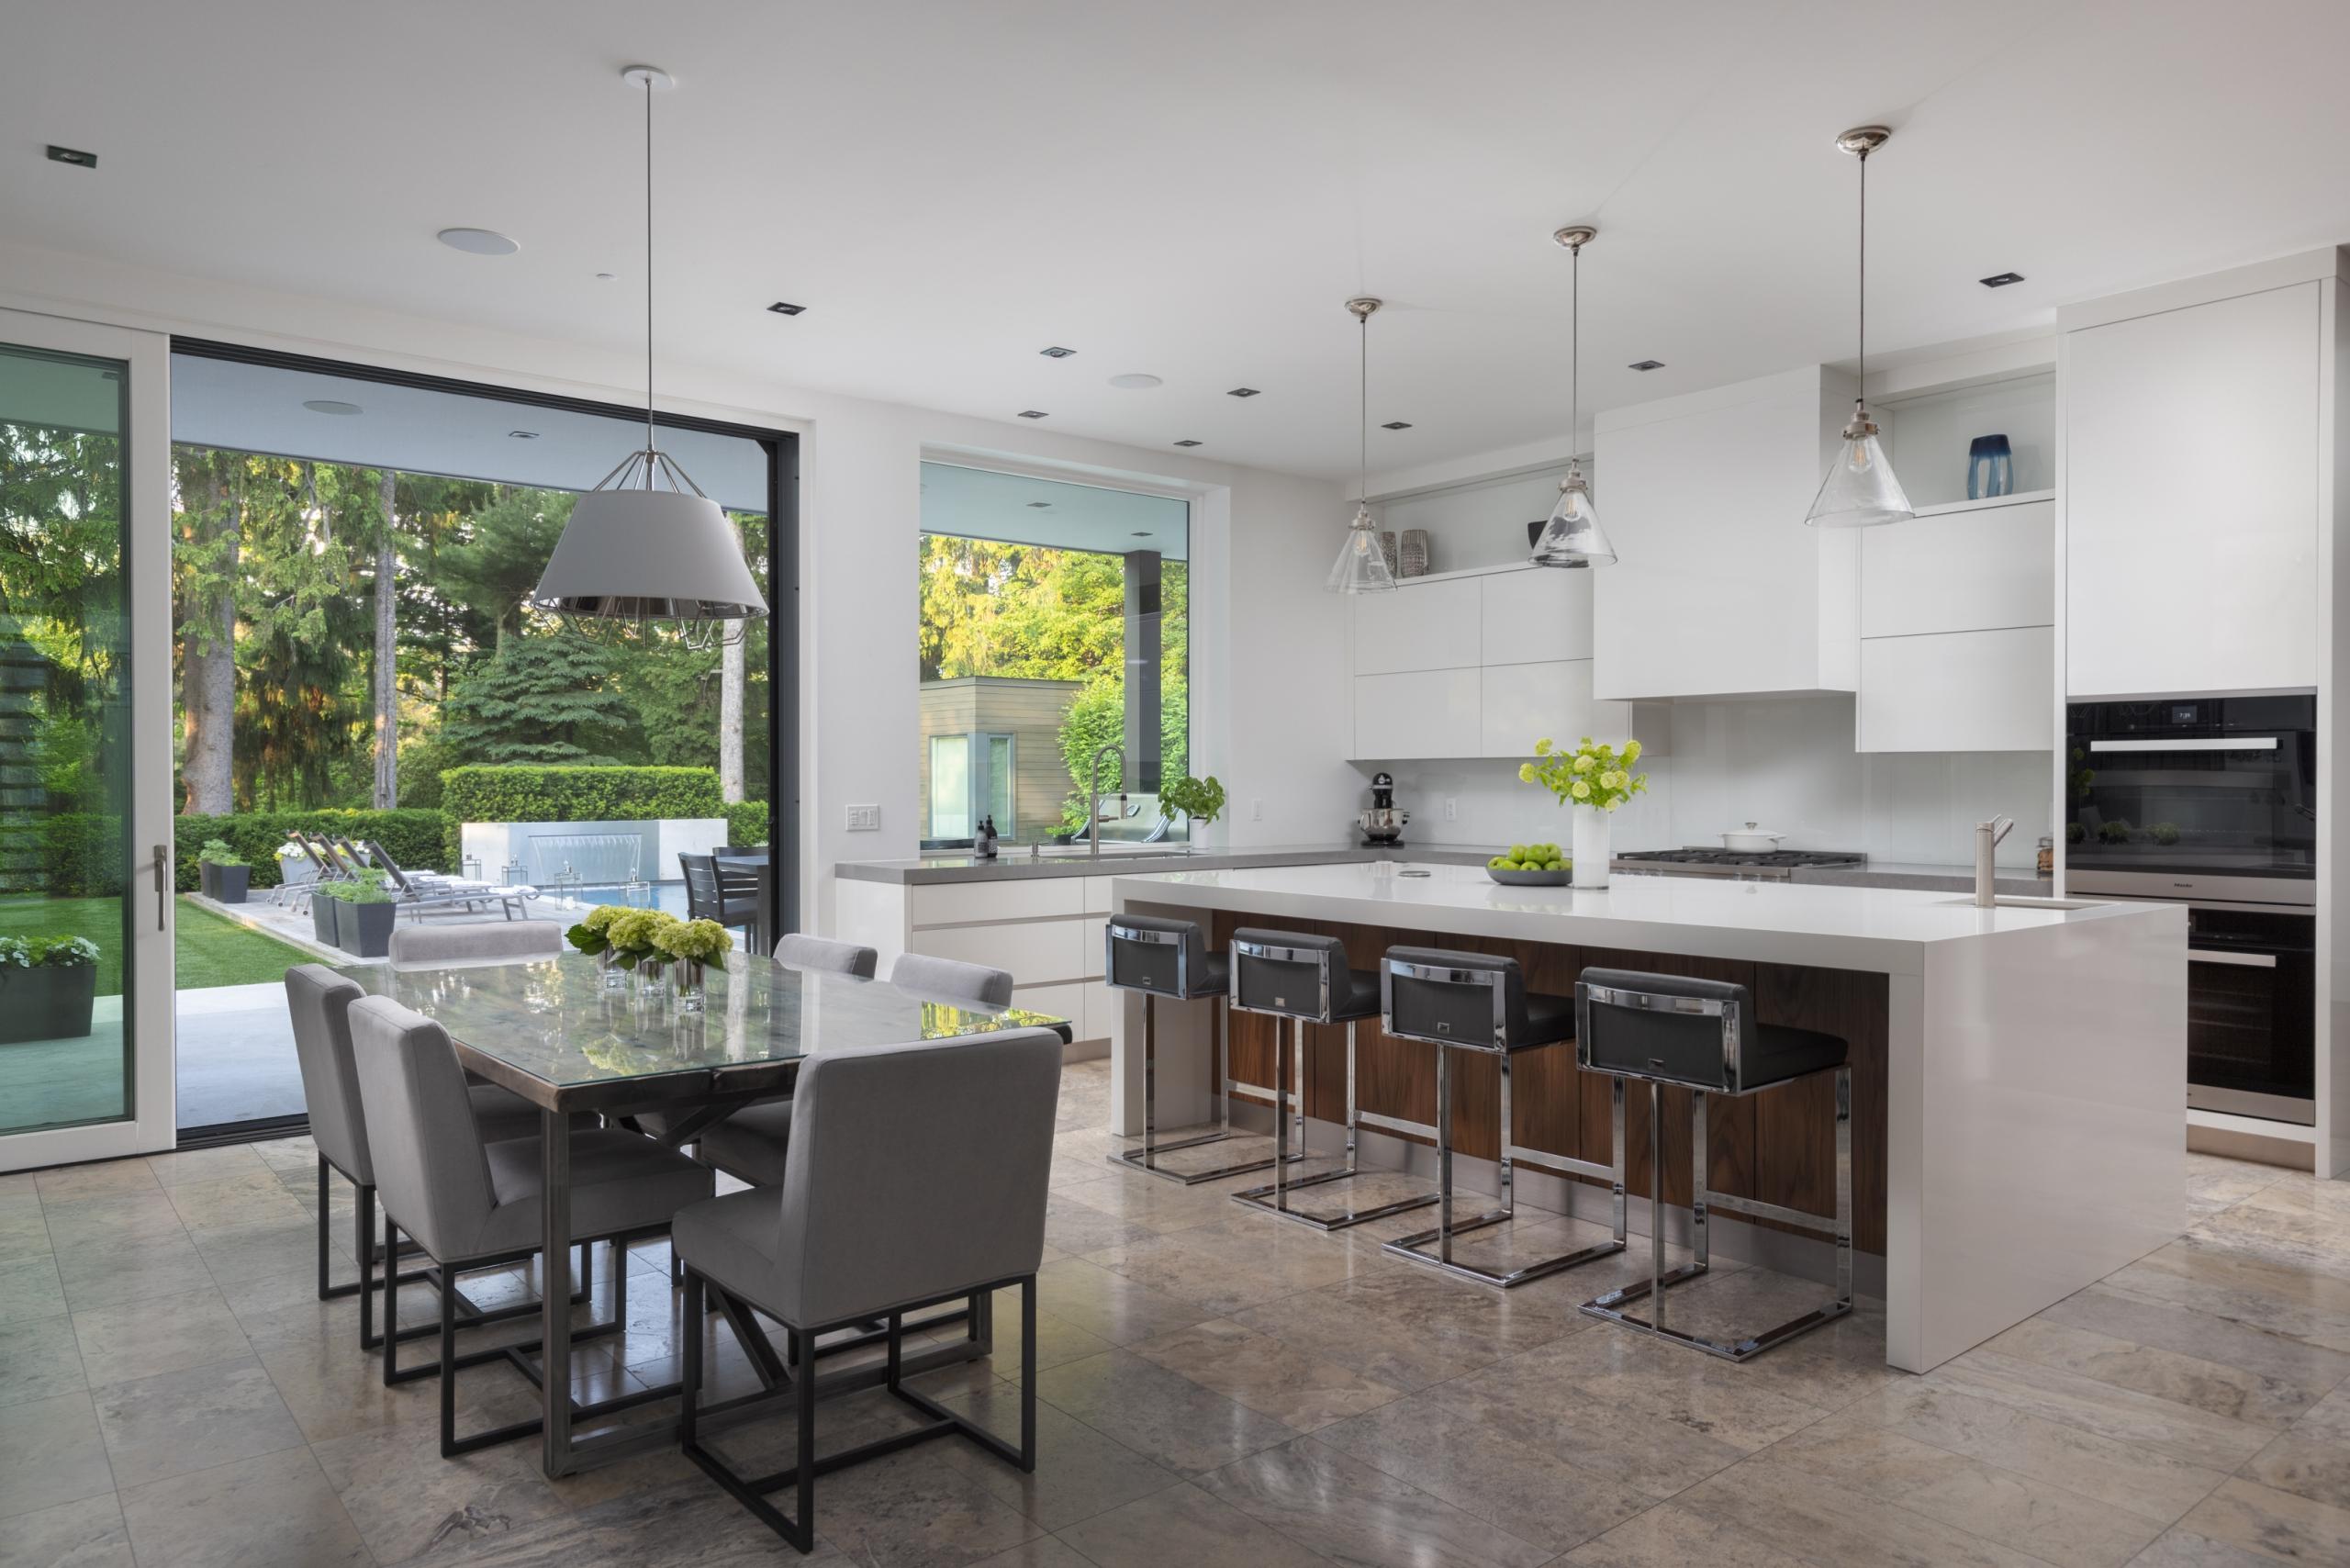 Kitchen featured at 65 Cox Drive, Oakville at Alex Irish & Associates